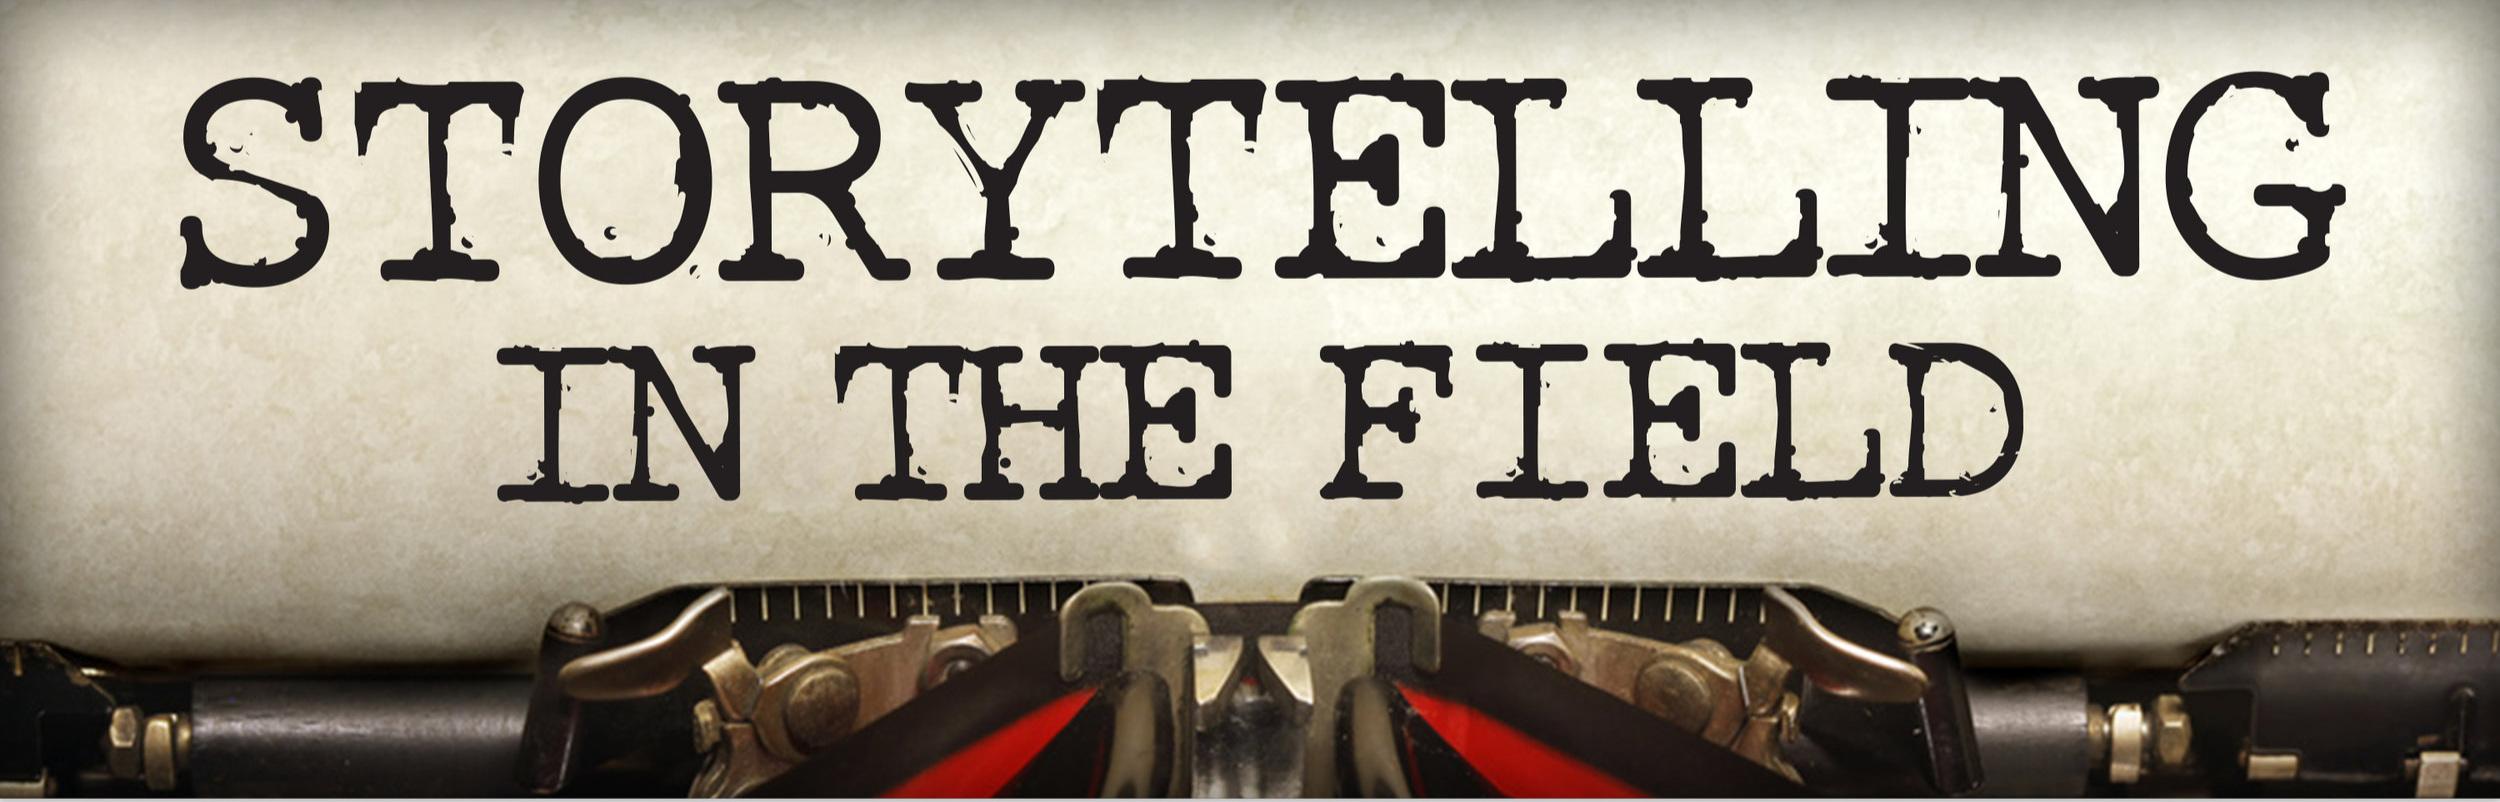 Tony+Hackett+-+Storytelling+in+the+Field+Album+Art+v3.jpg